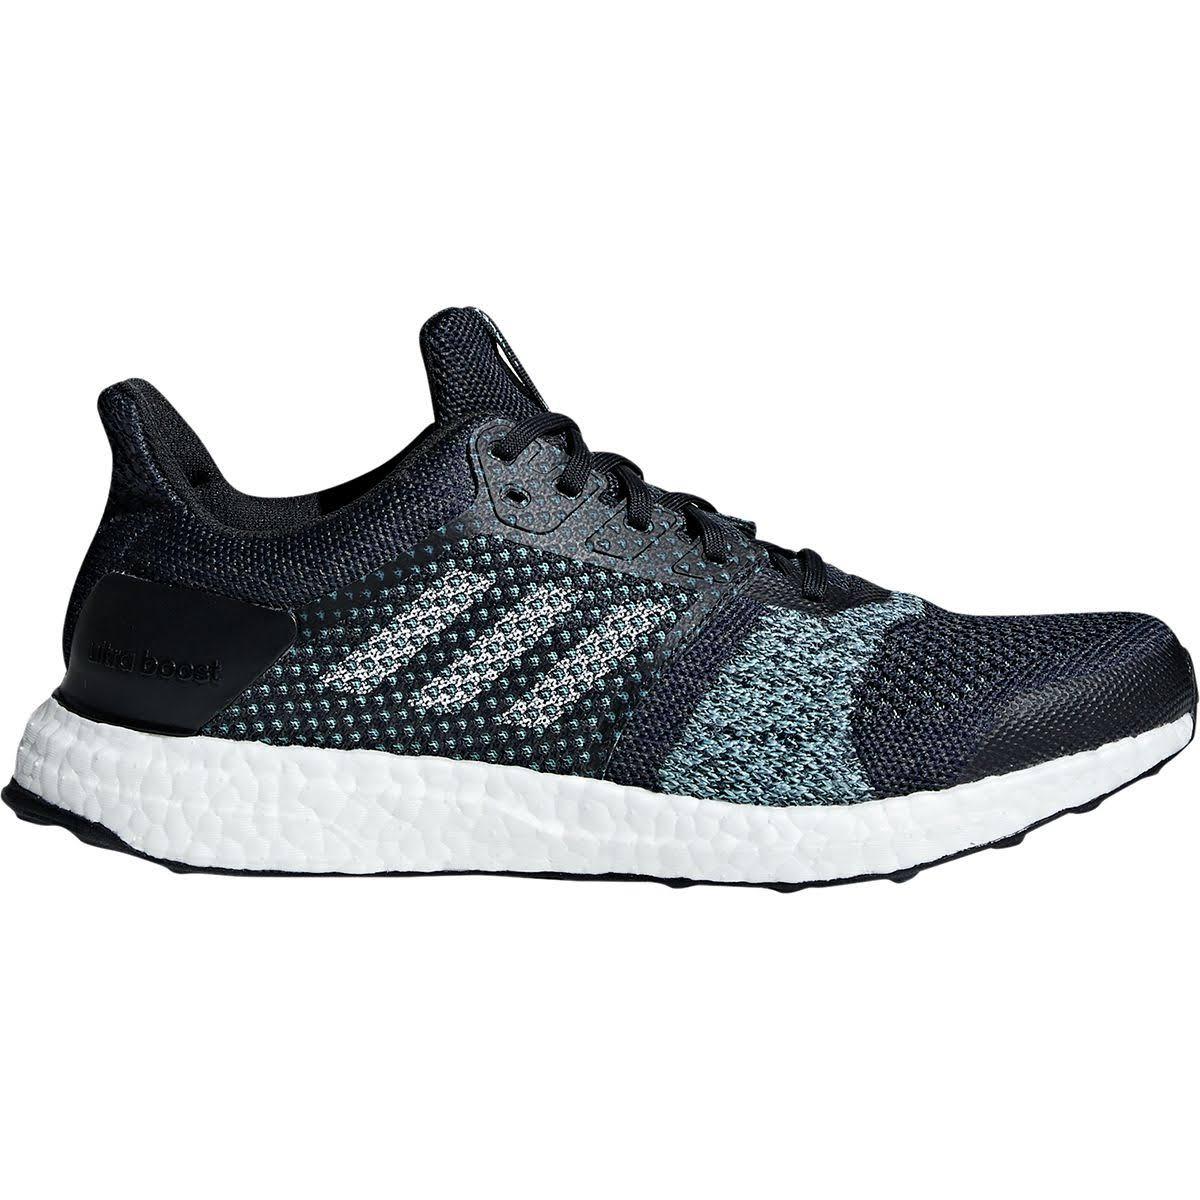 Hombre Running Stability De Zapatillas Ac7586 Ultraboost Para Parley Adidas wvz4qBxgz